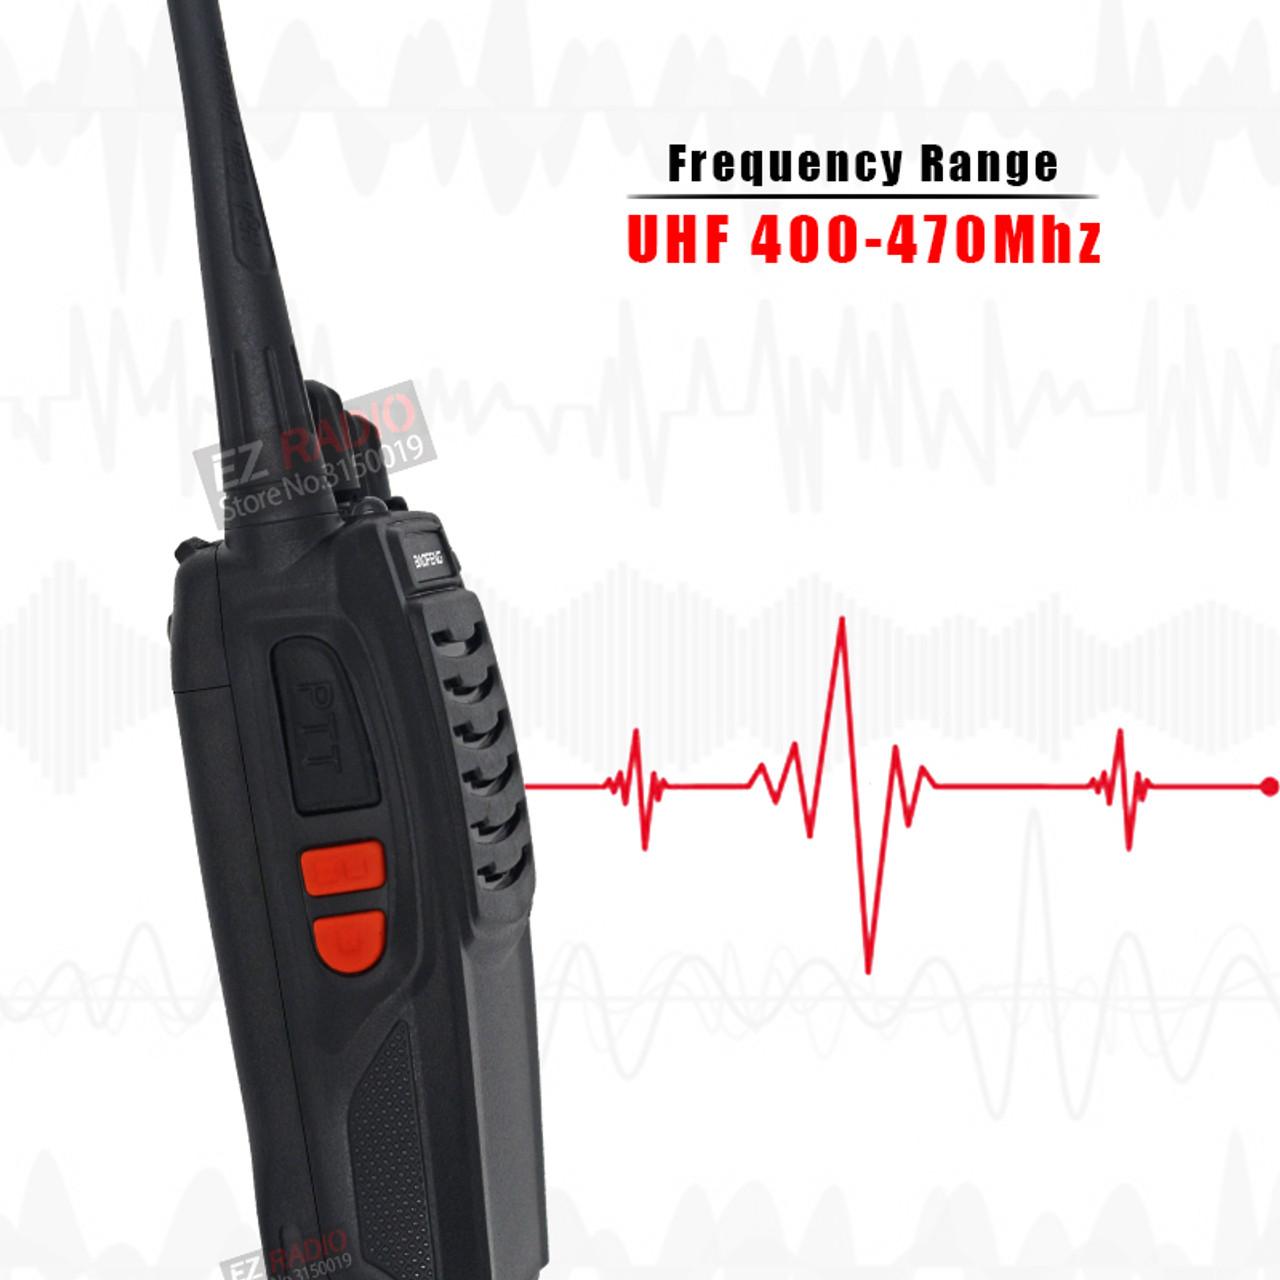 1pc Baofeng Walkie Talkie BF-C1 Cheap Pofung Baofeng Radio 5W 16CH UHF  400-470Mhz Walkie Talkies Upgrade 888S Baofeng bf-888s